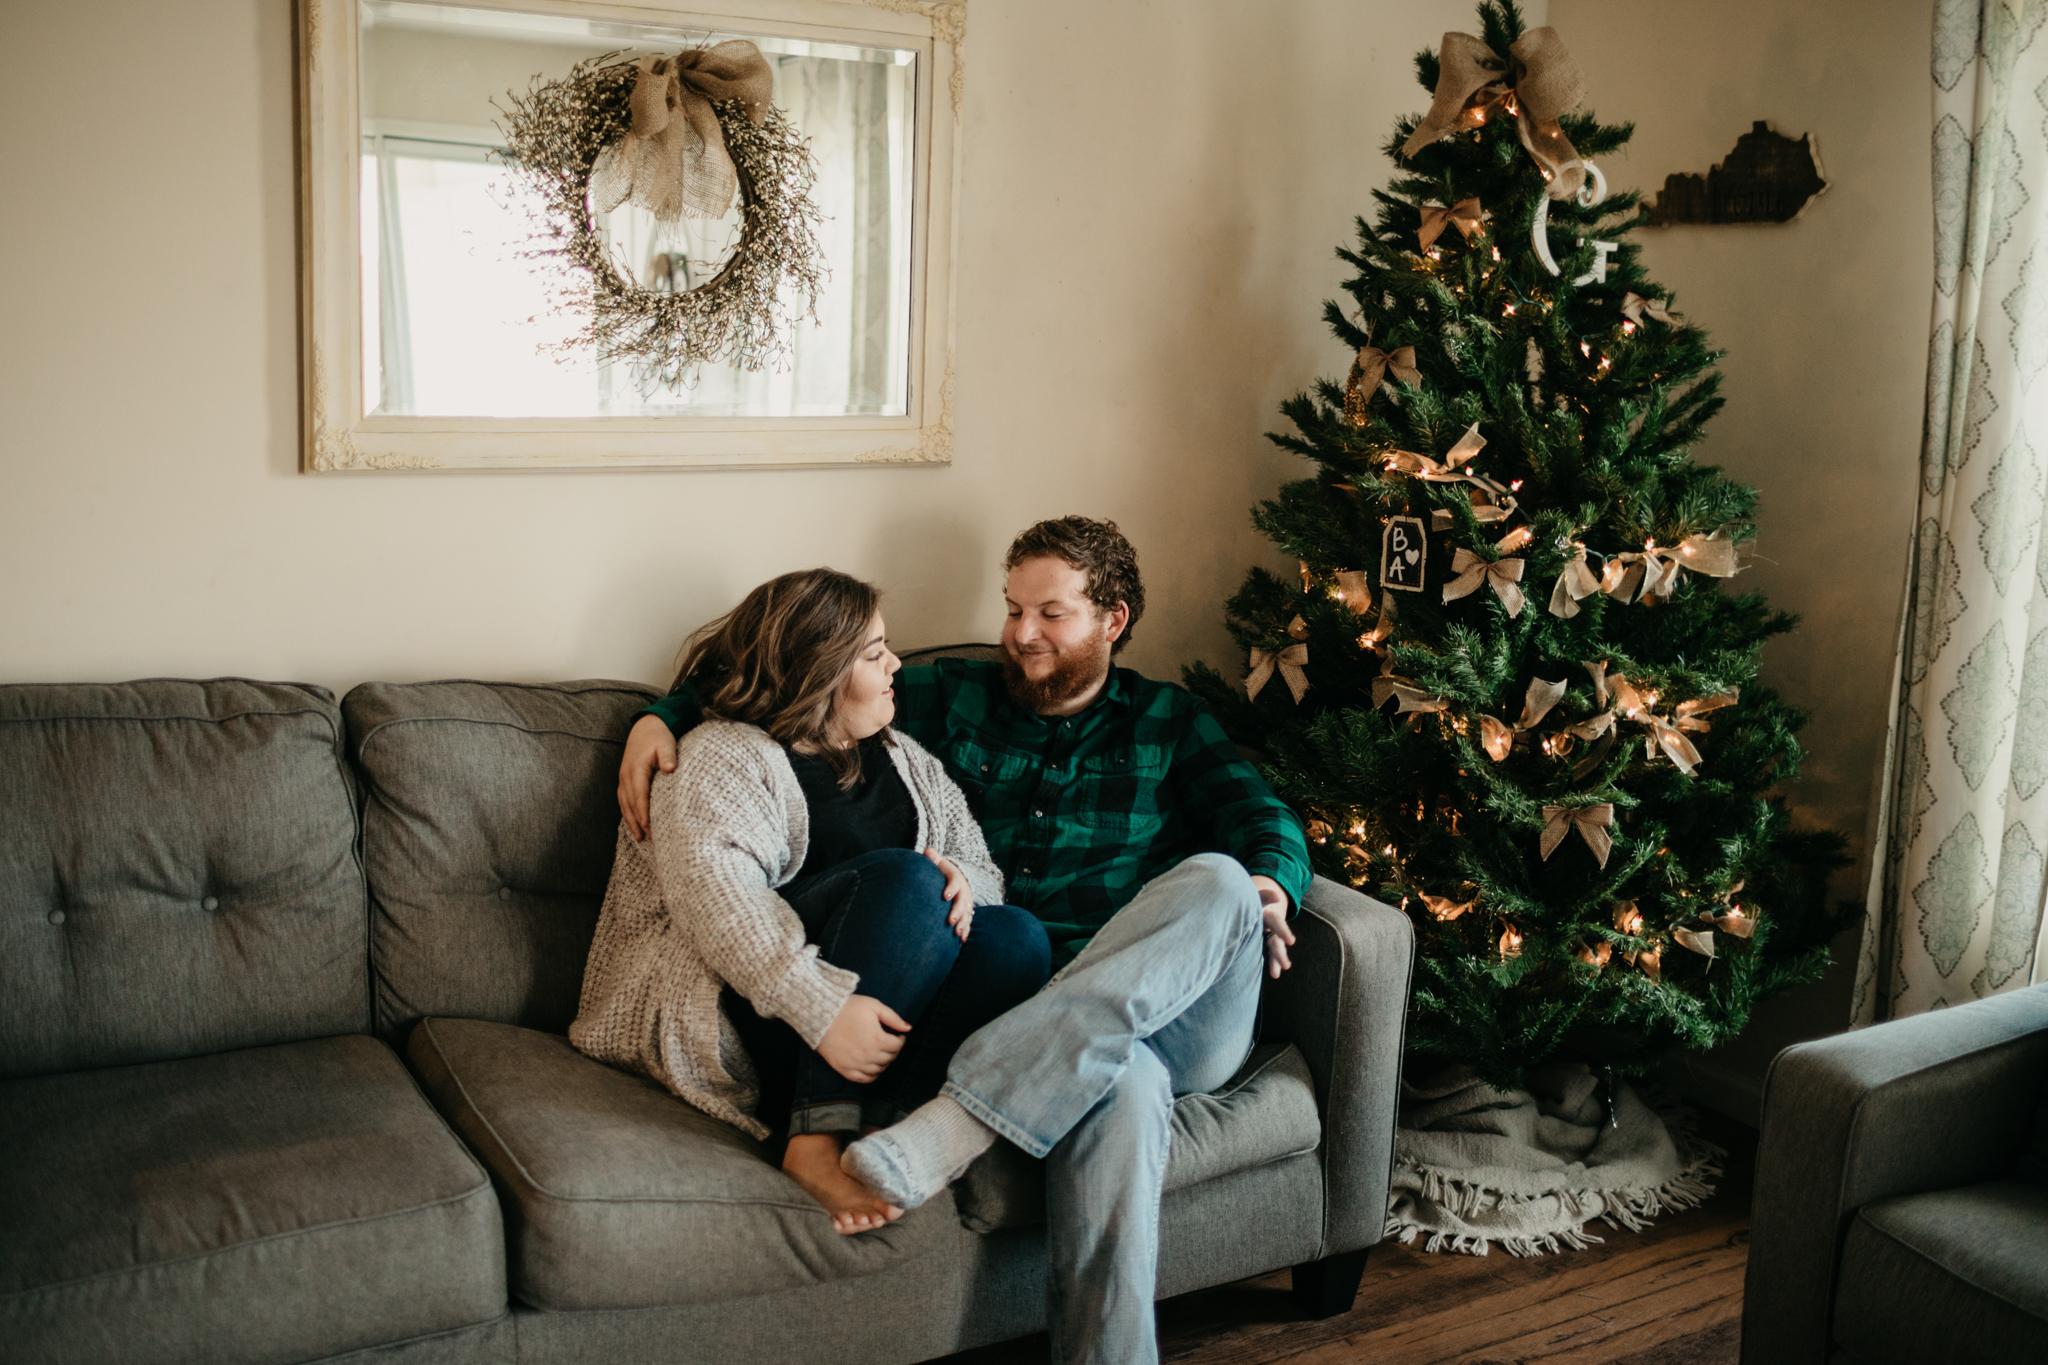 billie-shaye-style-photography-www.billieshayestyle.com-lifestyle-couple-christmas-cuddle-session-nashville-tennessee-8450.jpg